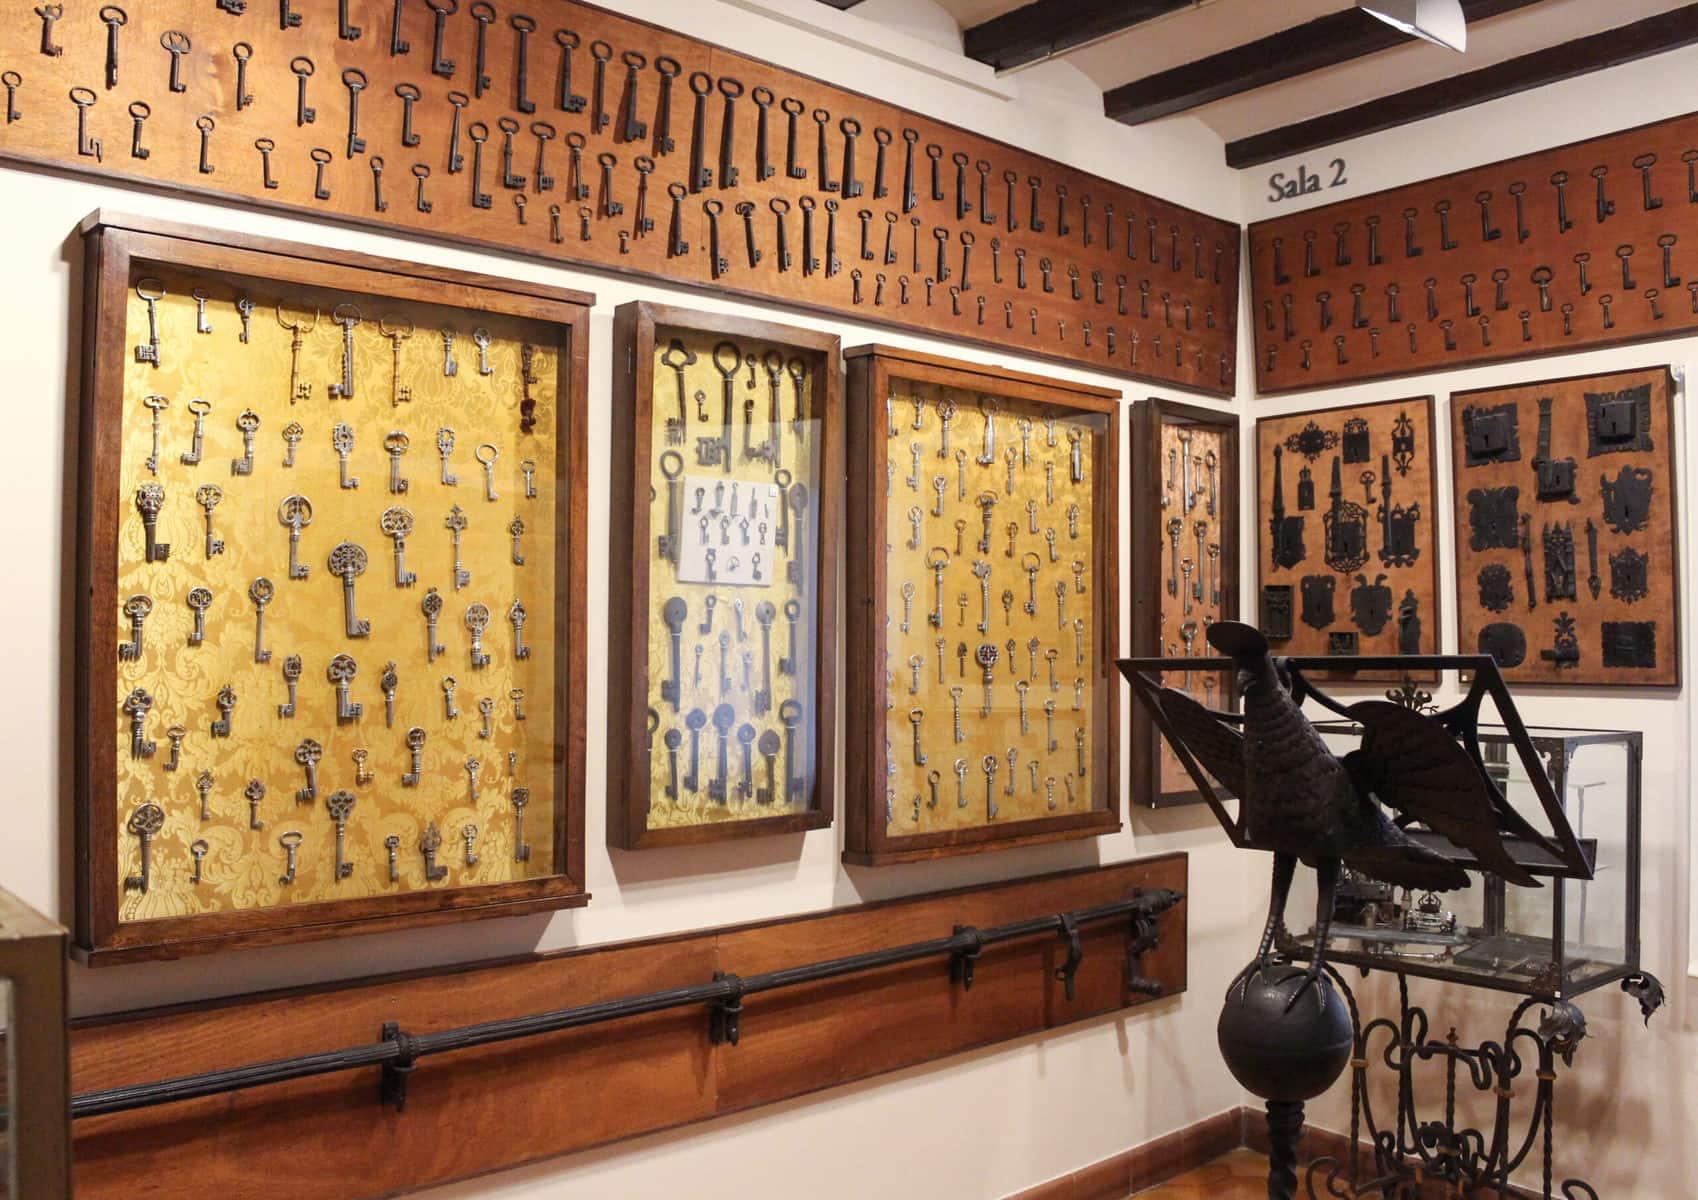 Museum Frederic Marès - oberes Stockwerke mit Massensammlungen, Barcelona